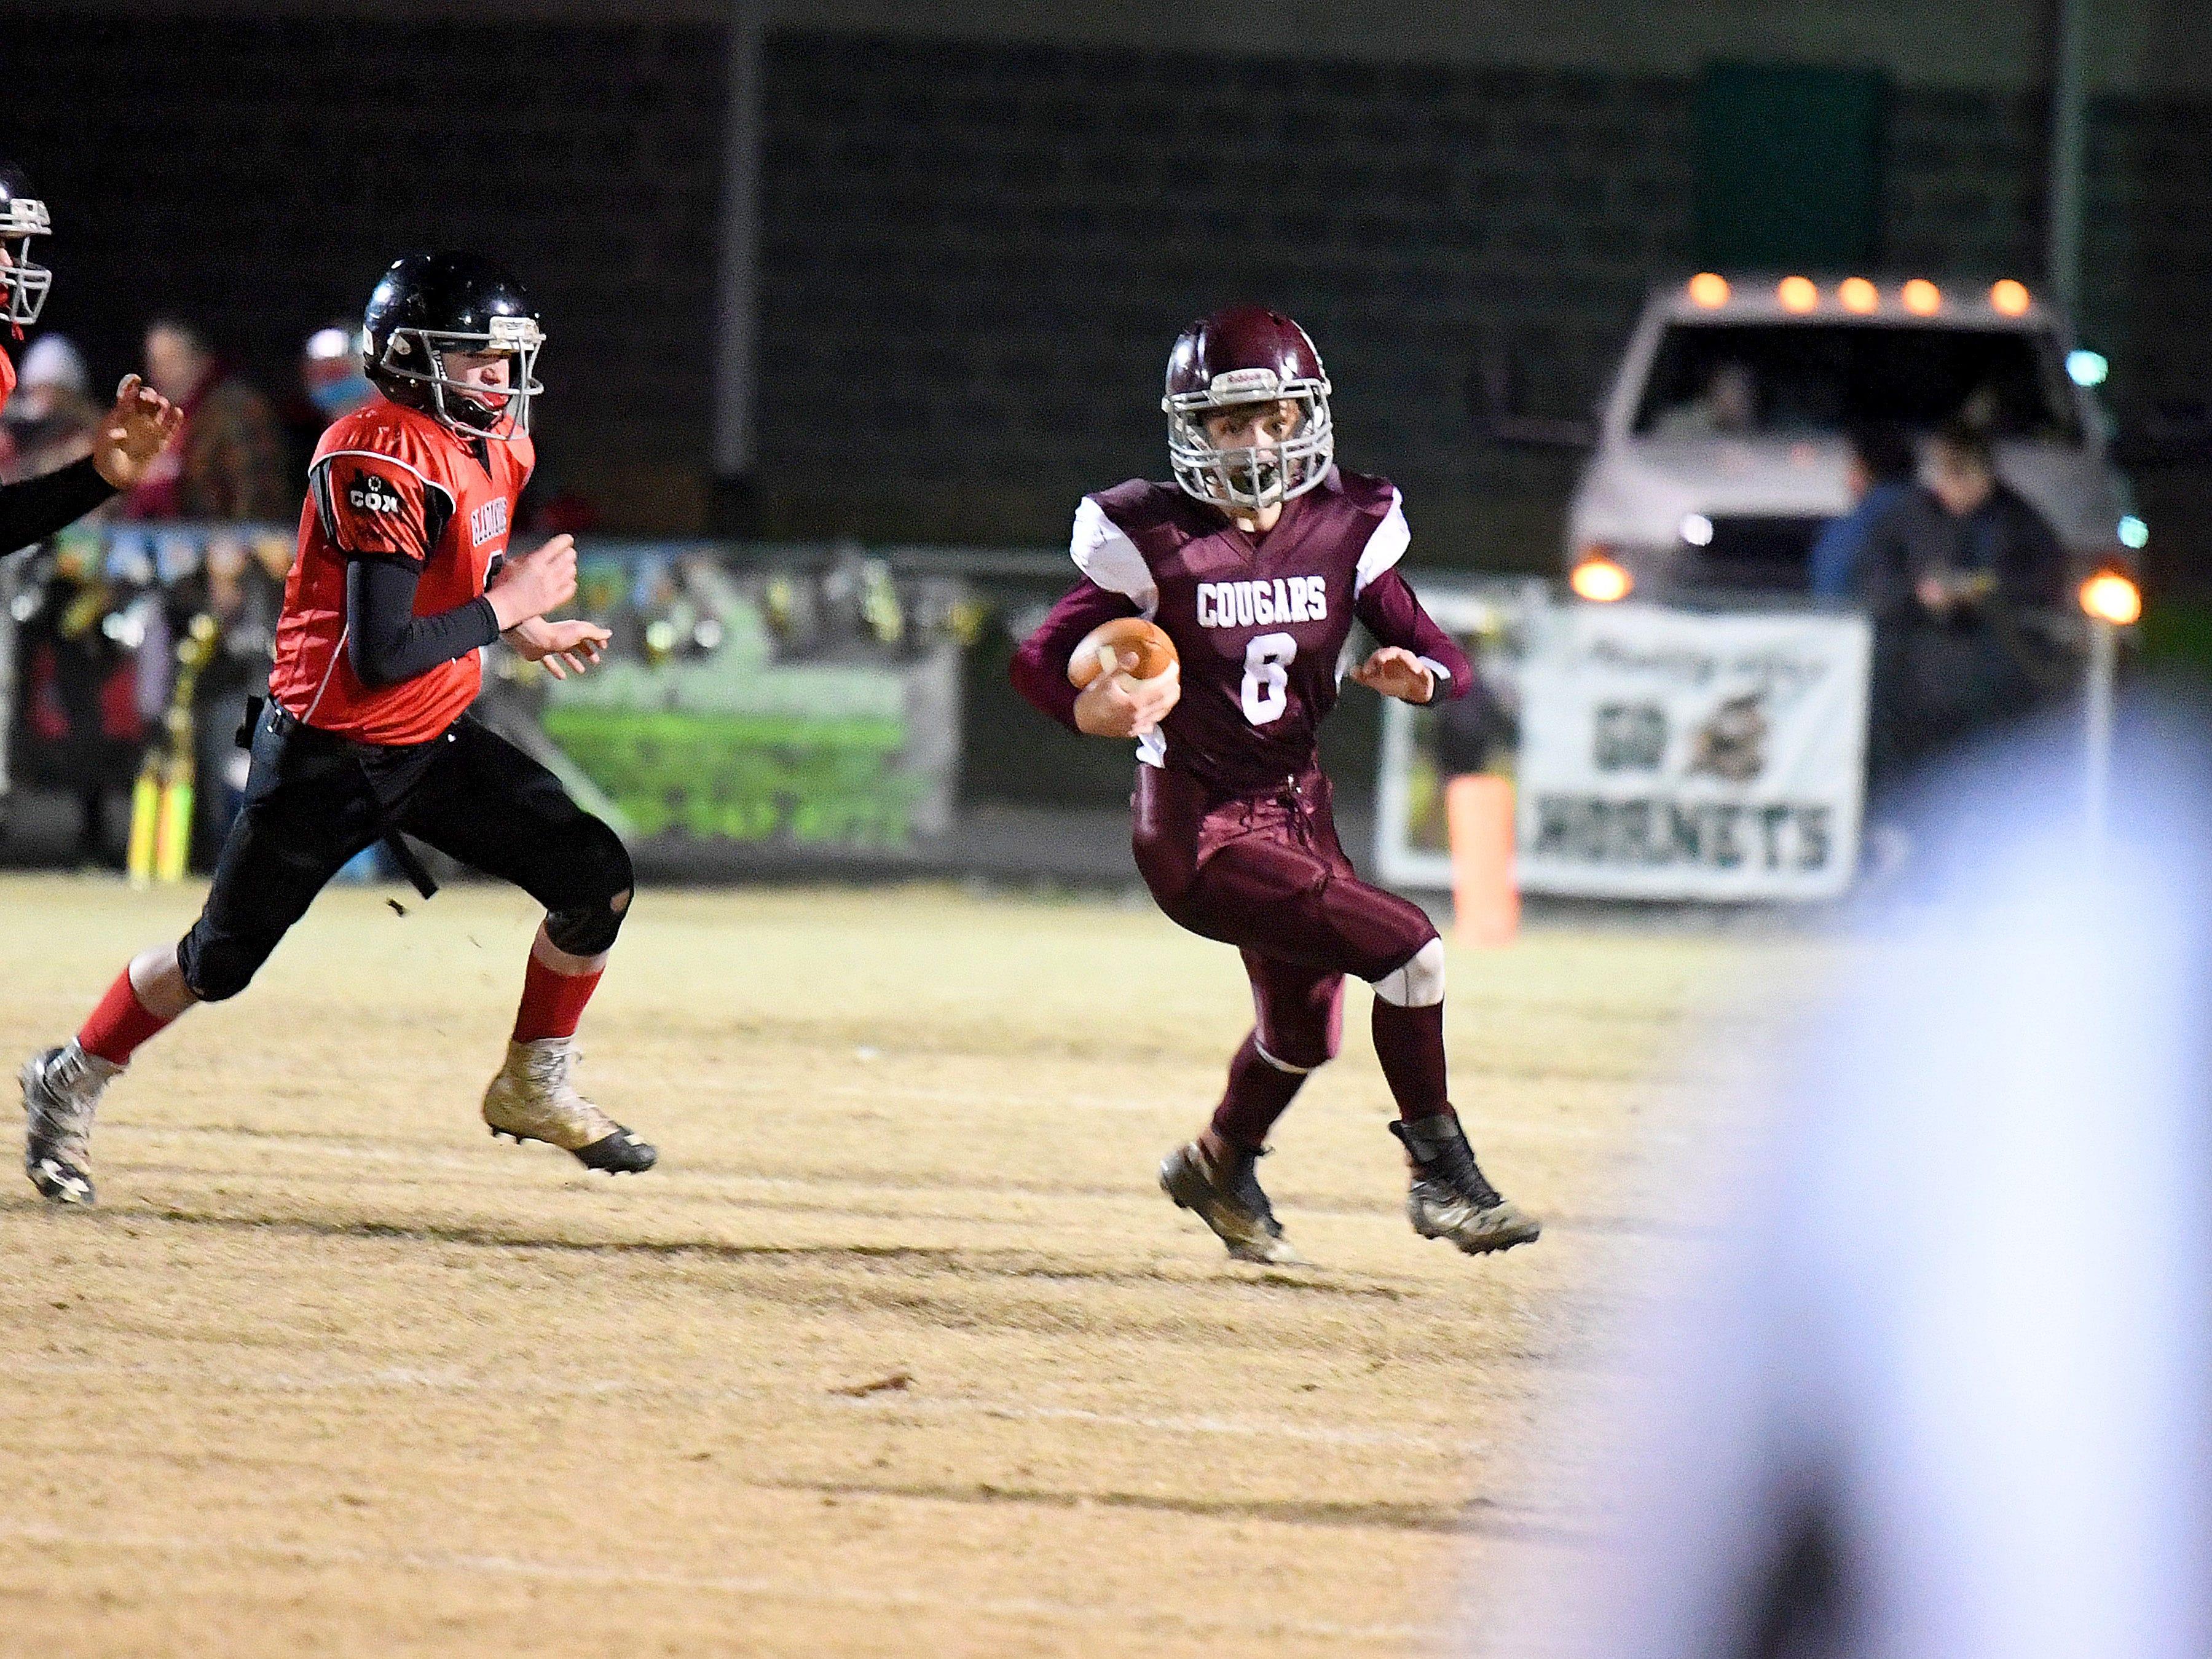 Stuarts Draft's Jacob Bryan runs the football during the Augusta County Quarterback Club Seniors Super Bowl in Fishersville on Sunday, Nov. 11, 2018.  RIverheads defeats Stuarts Draft, 38-6.